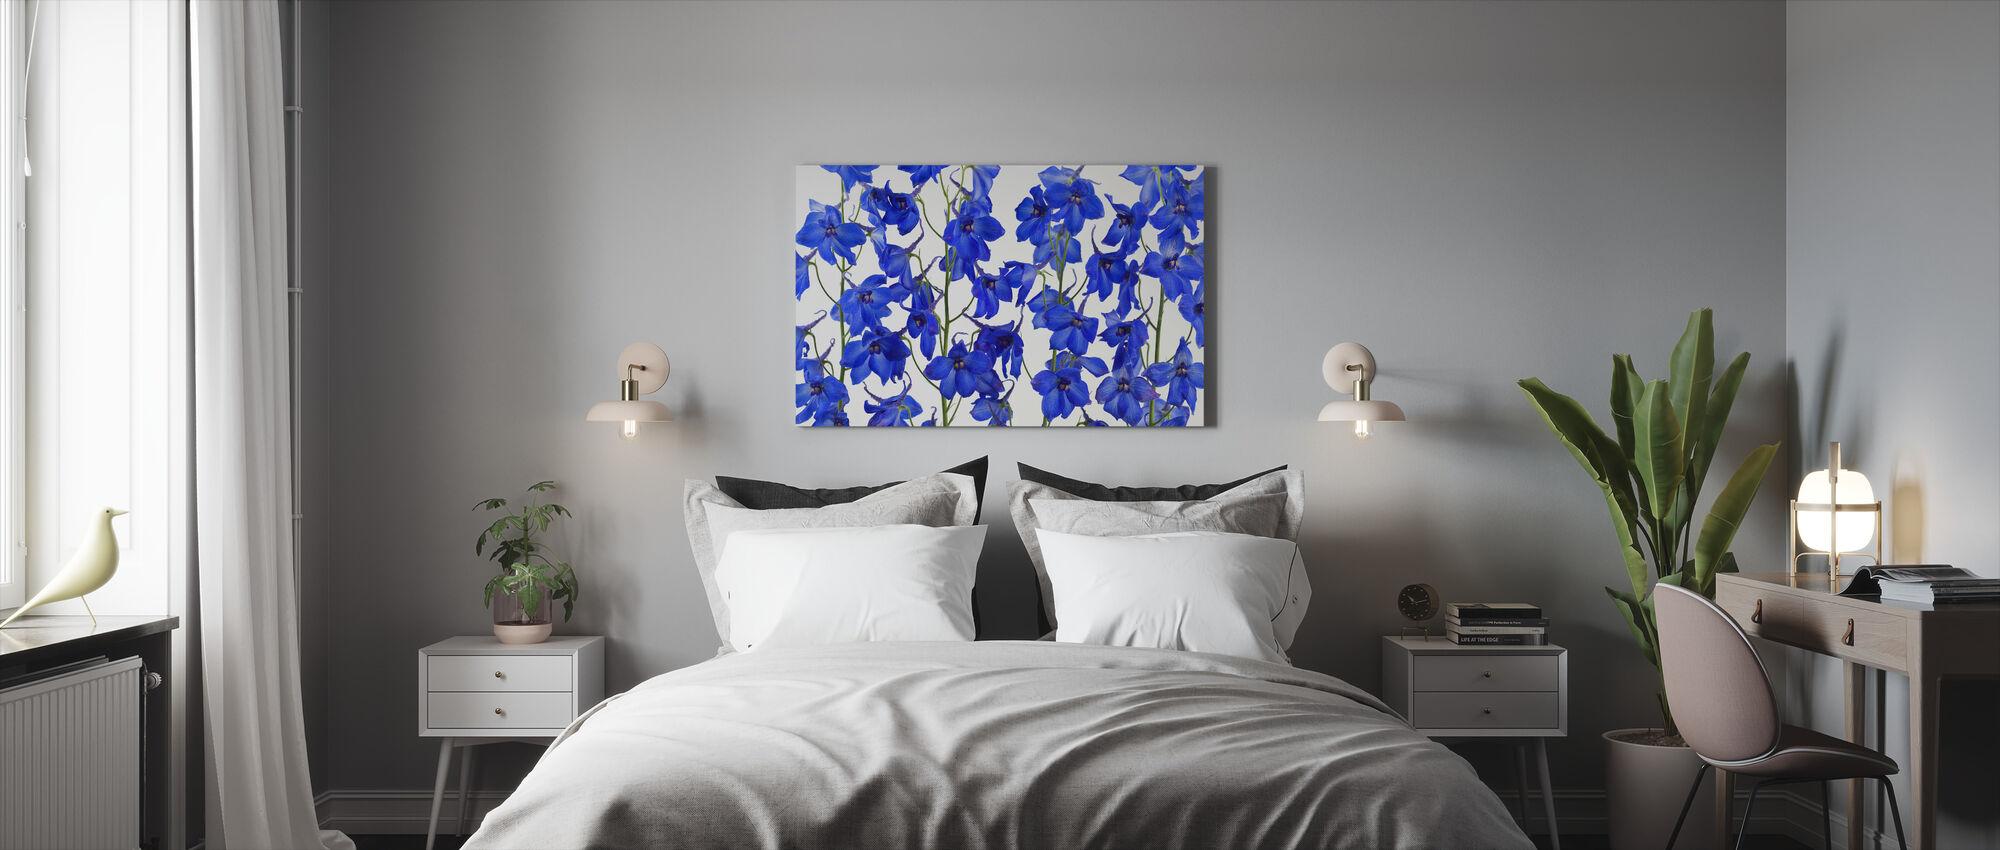 Blue Flowers - Canvas print - Bedroom